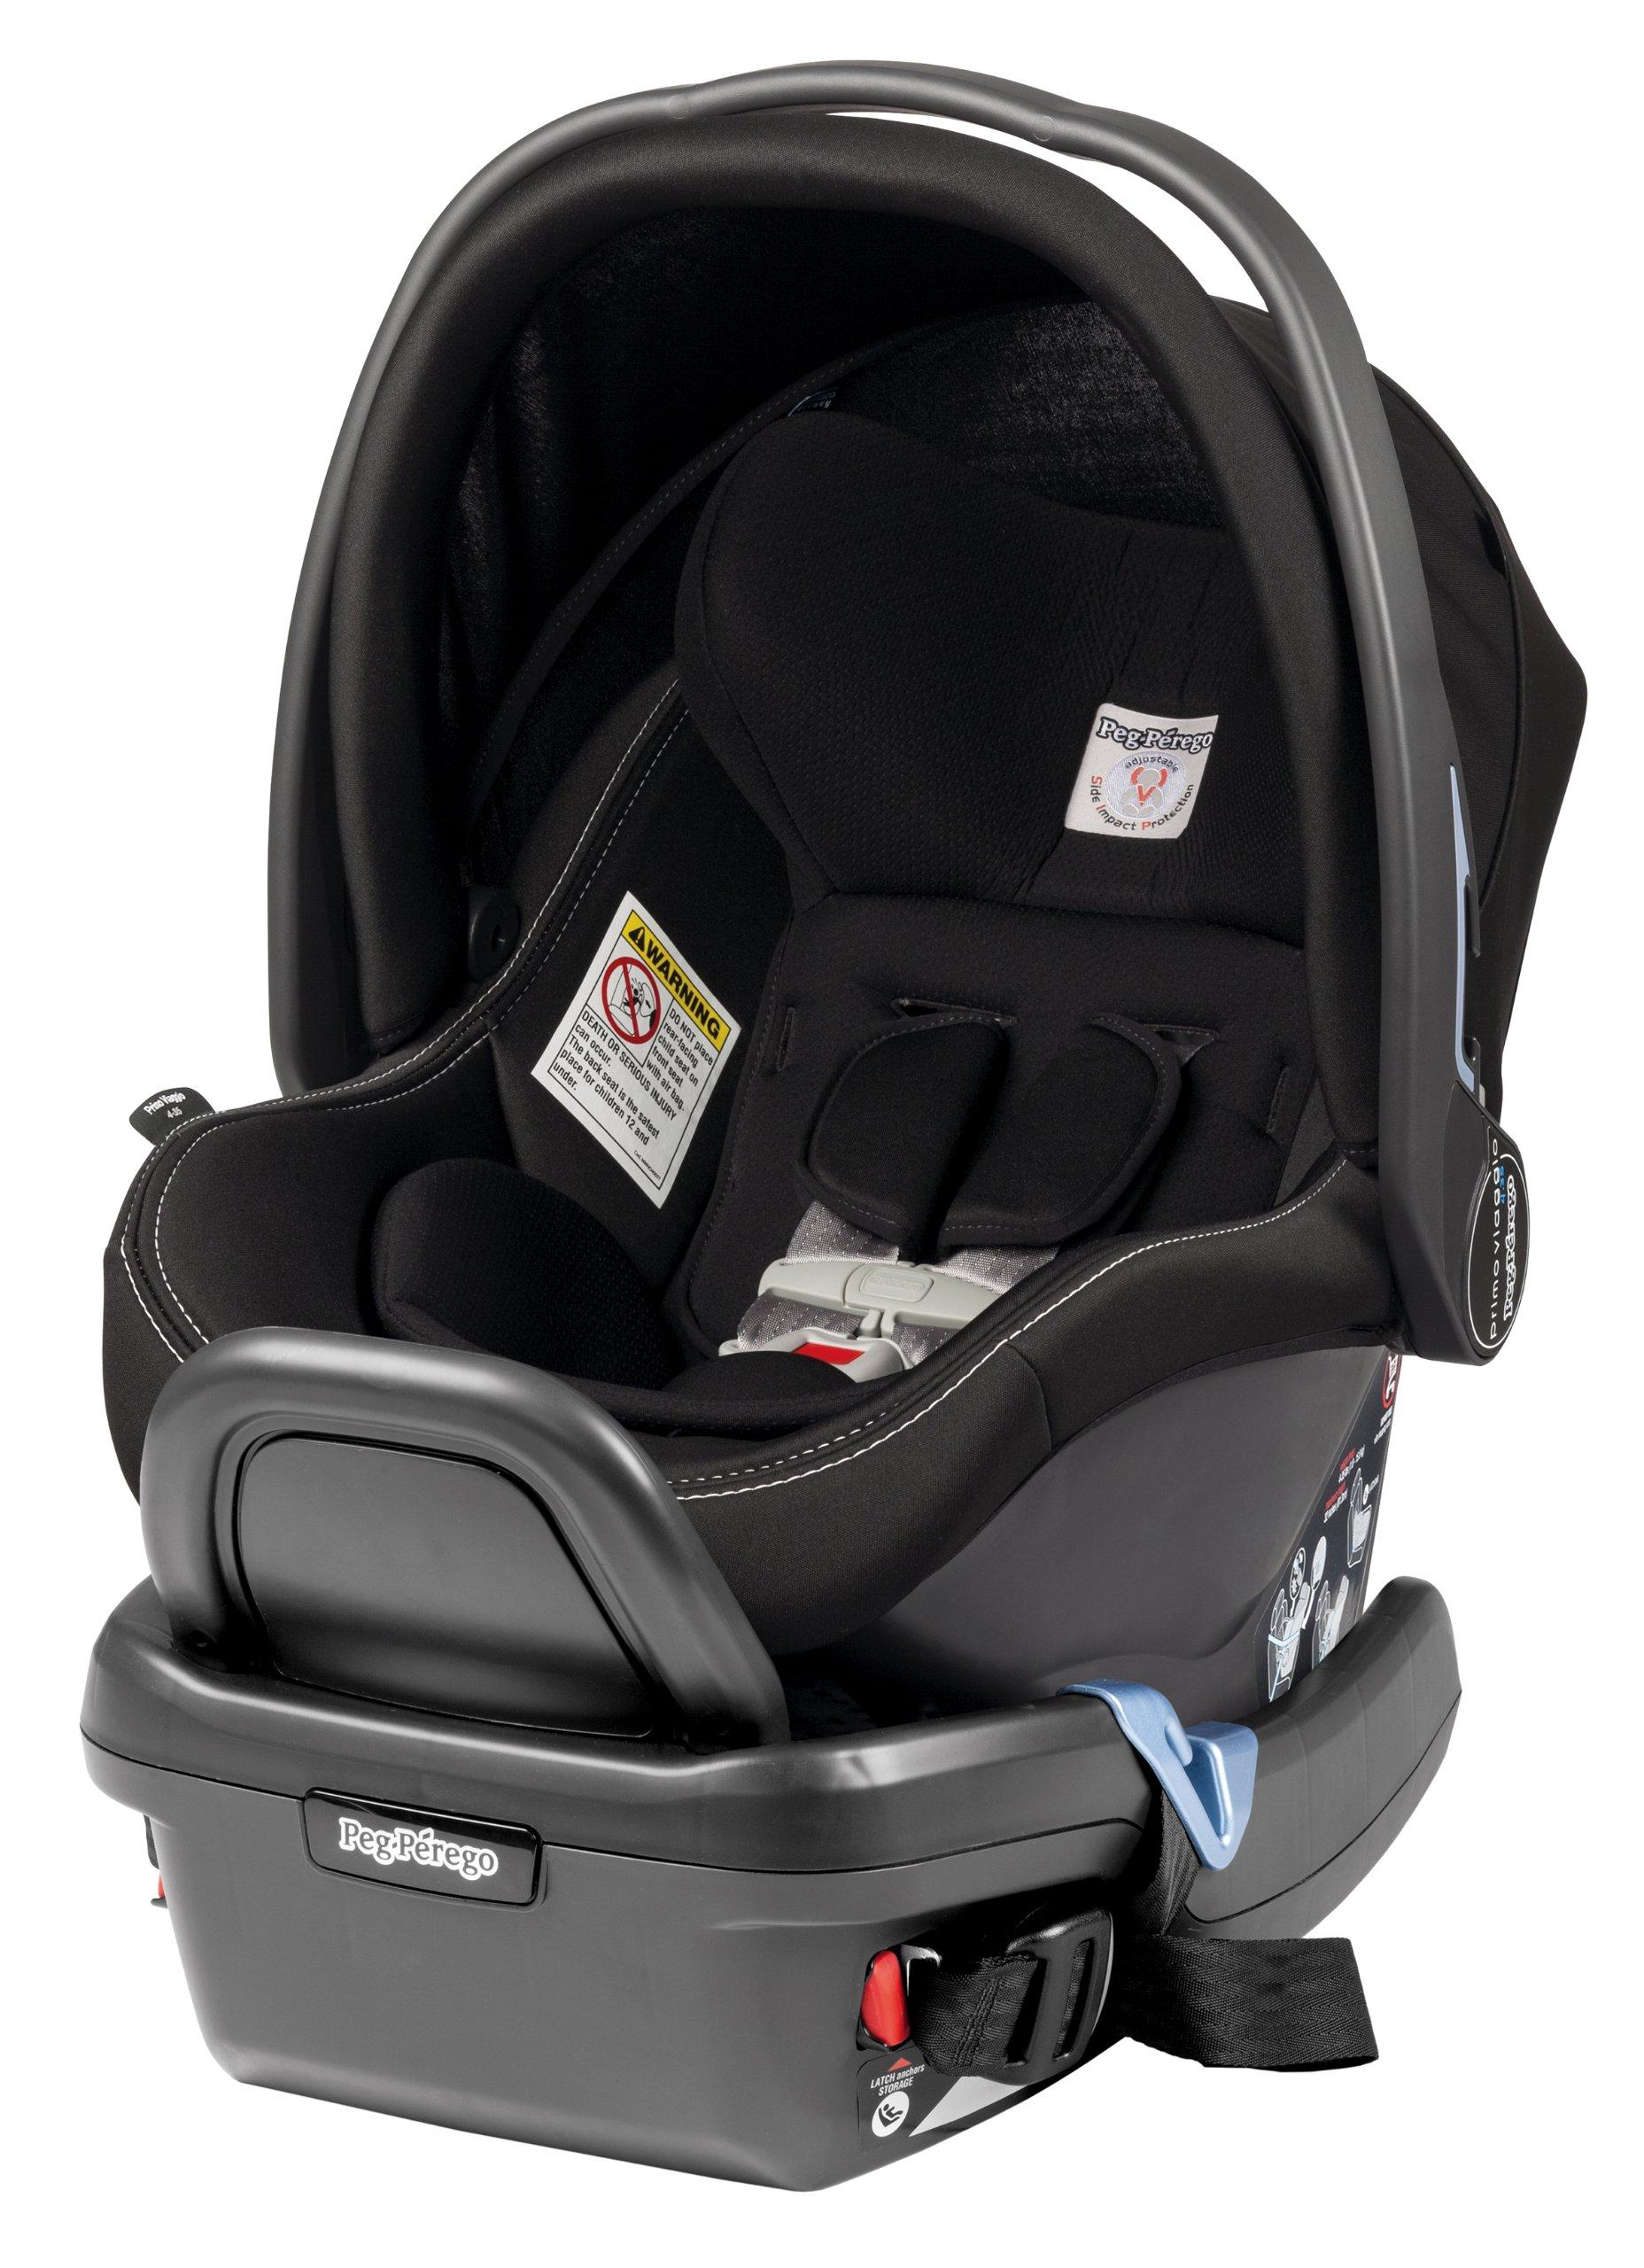 Peg Perego Primo Viaggio 4 35 Infant Car Seat with base yx